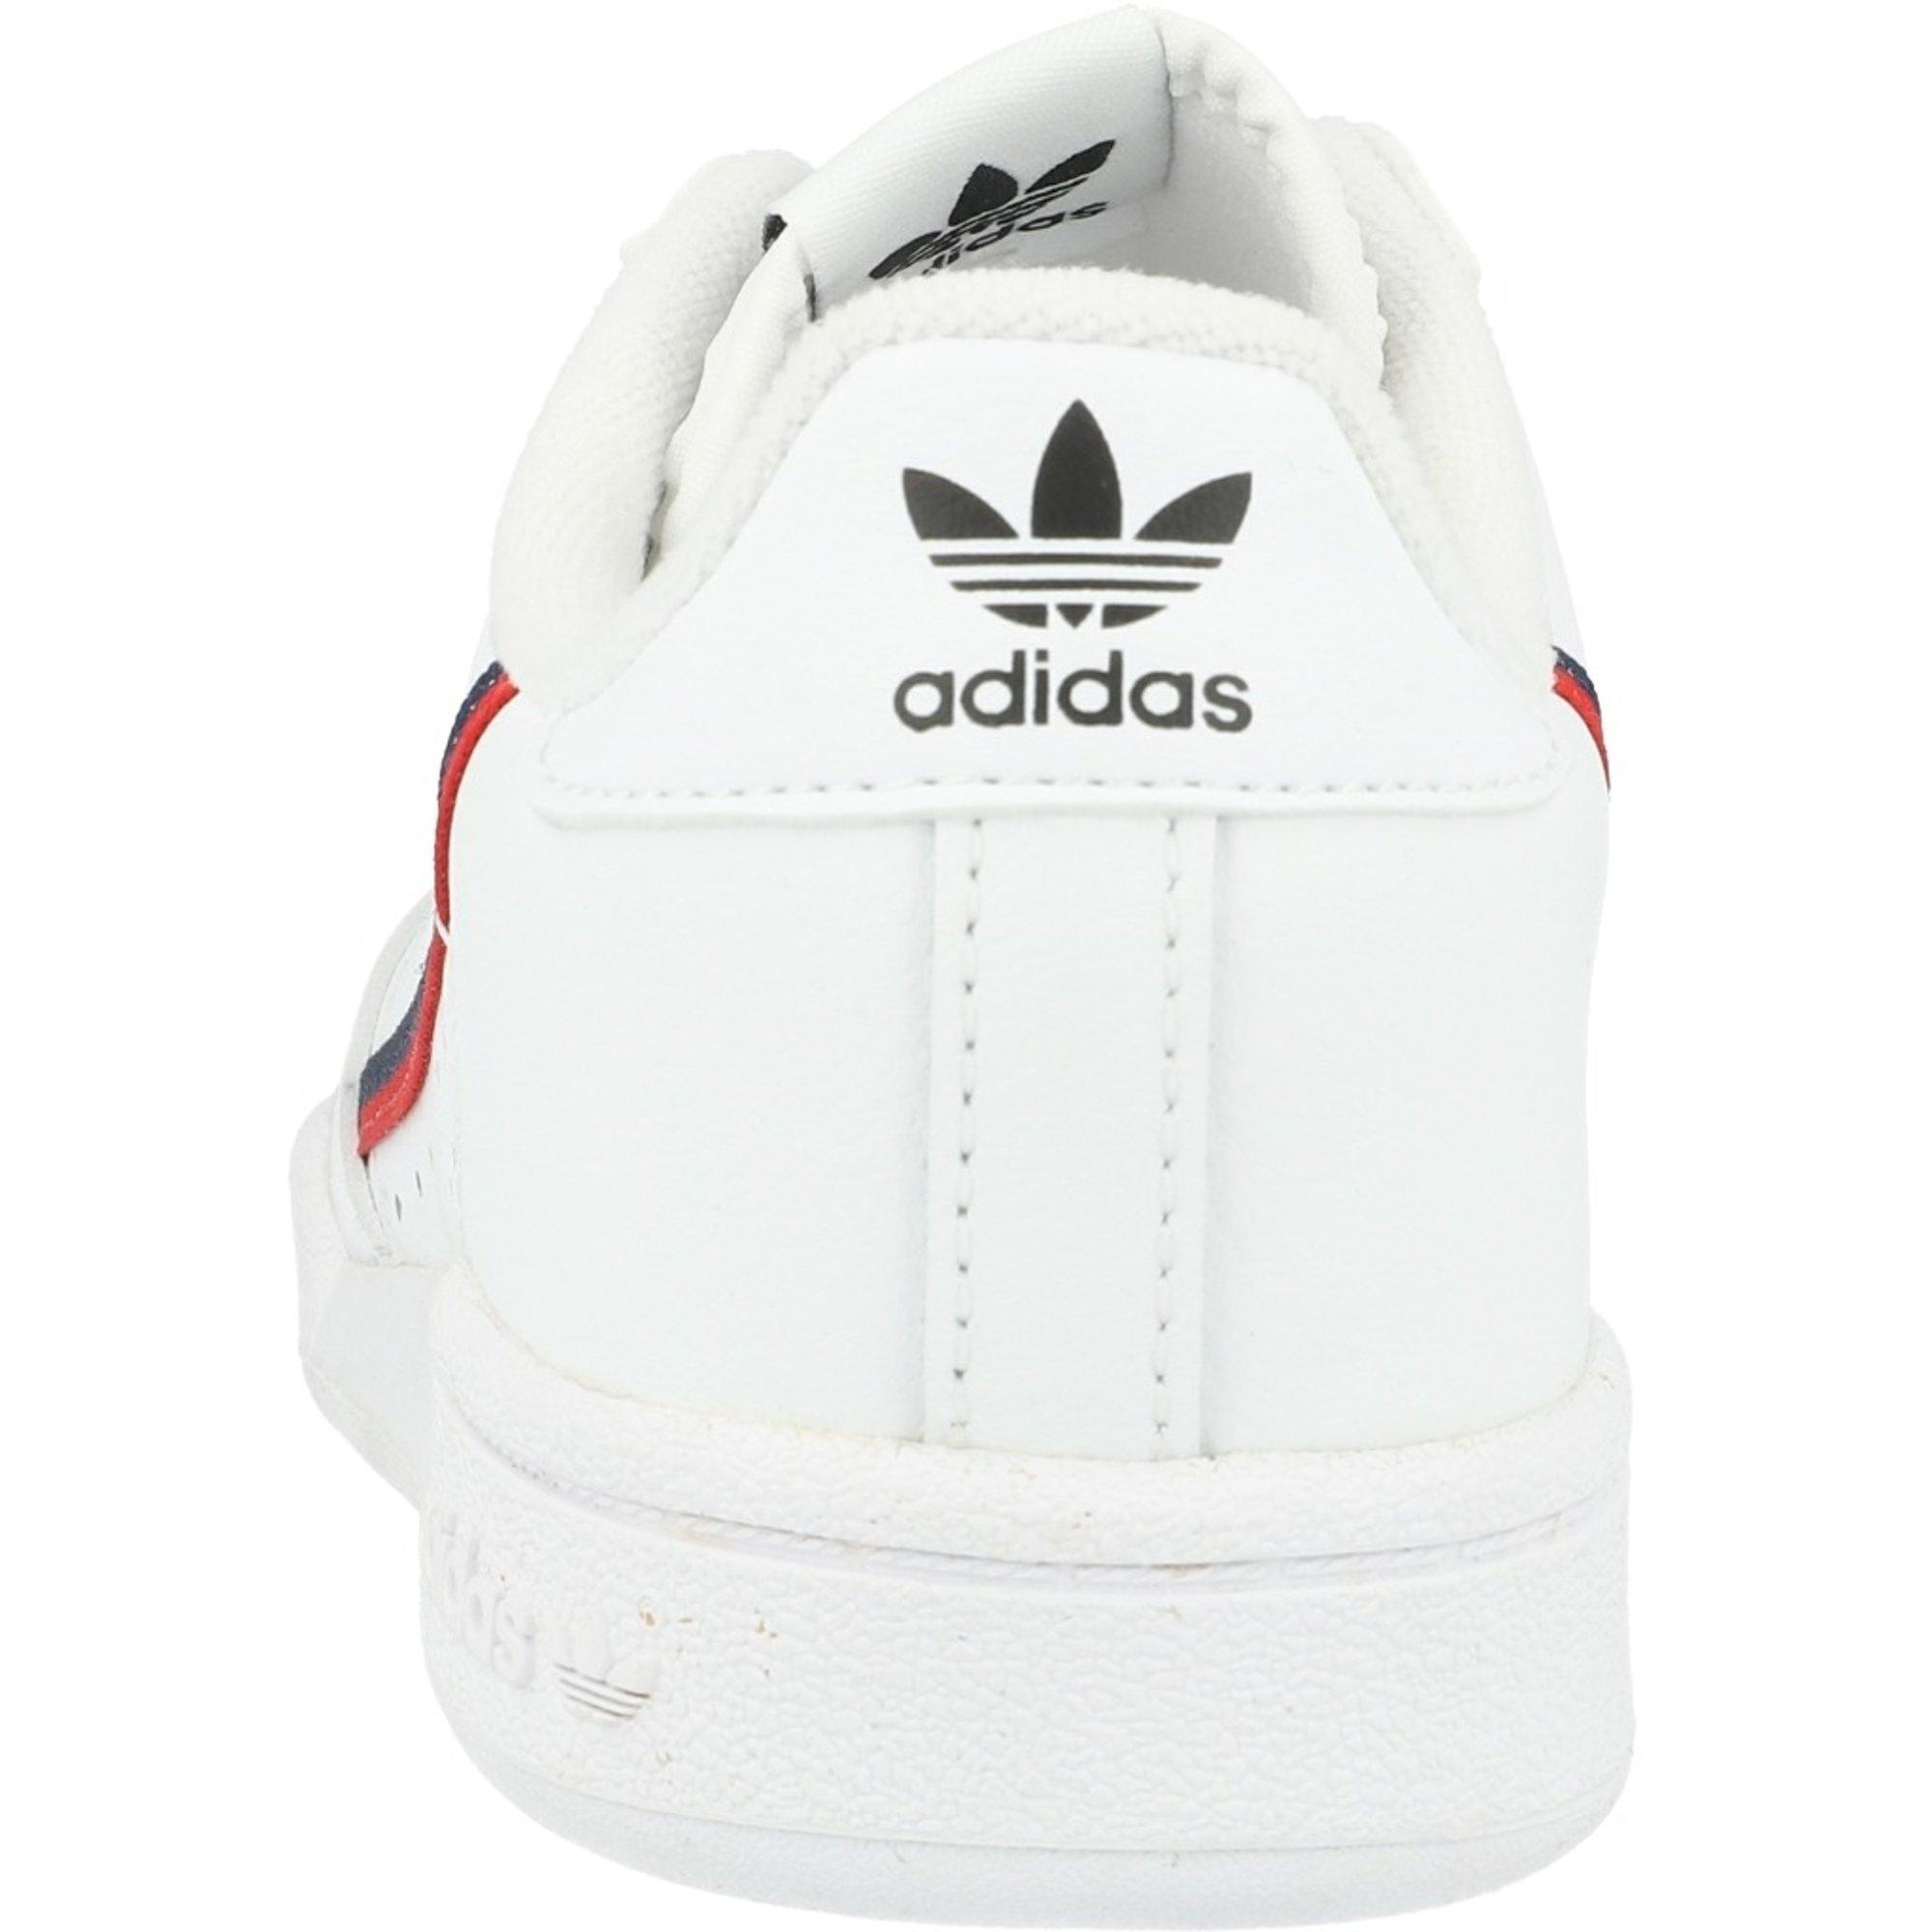 adidas Originals Continental 80 C Bianca Pelle Bambino